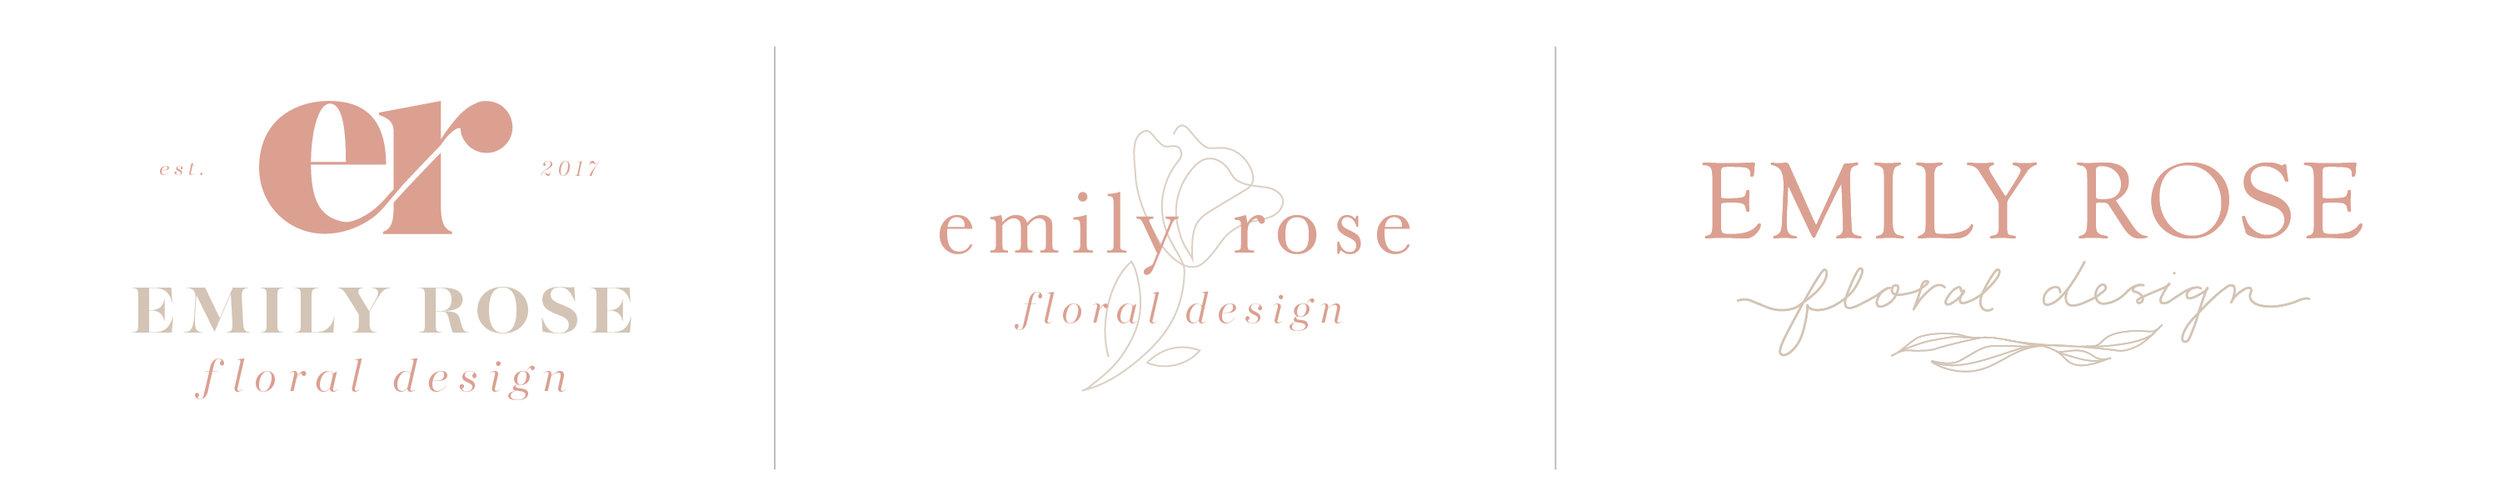 EmilyRose_FirstLook_all3-06.jpg